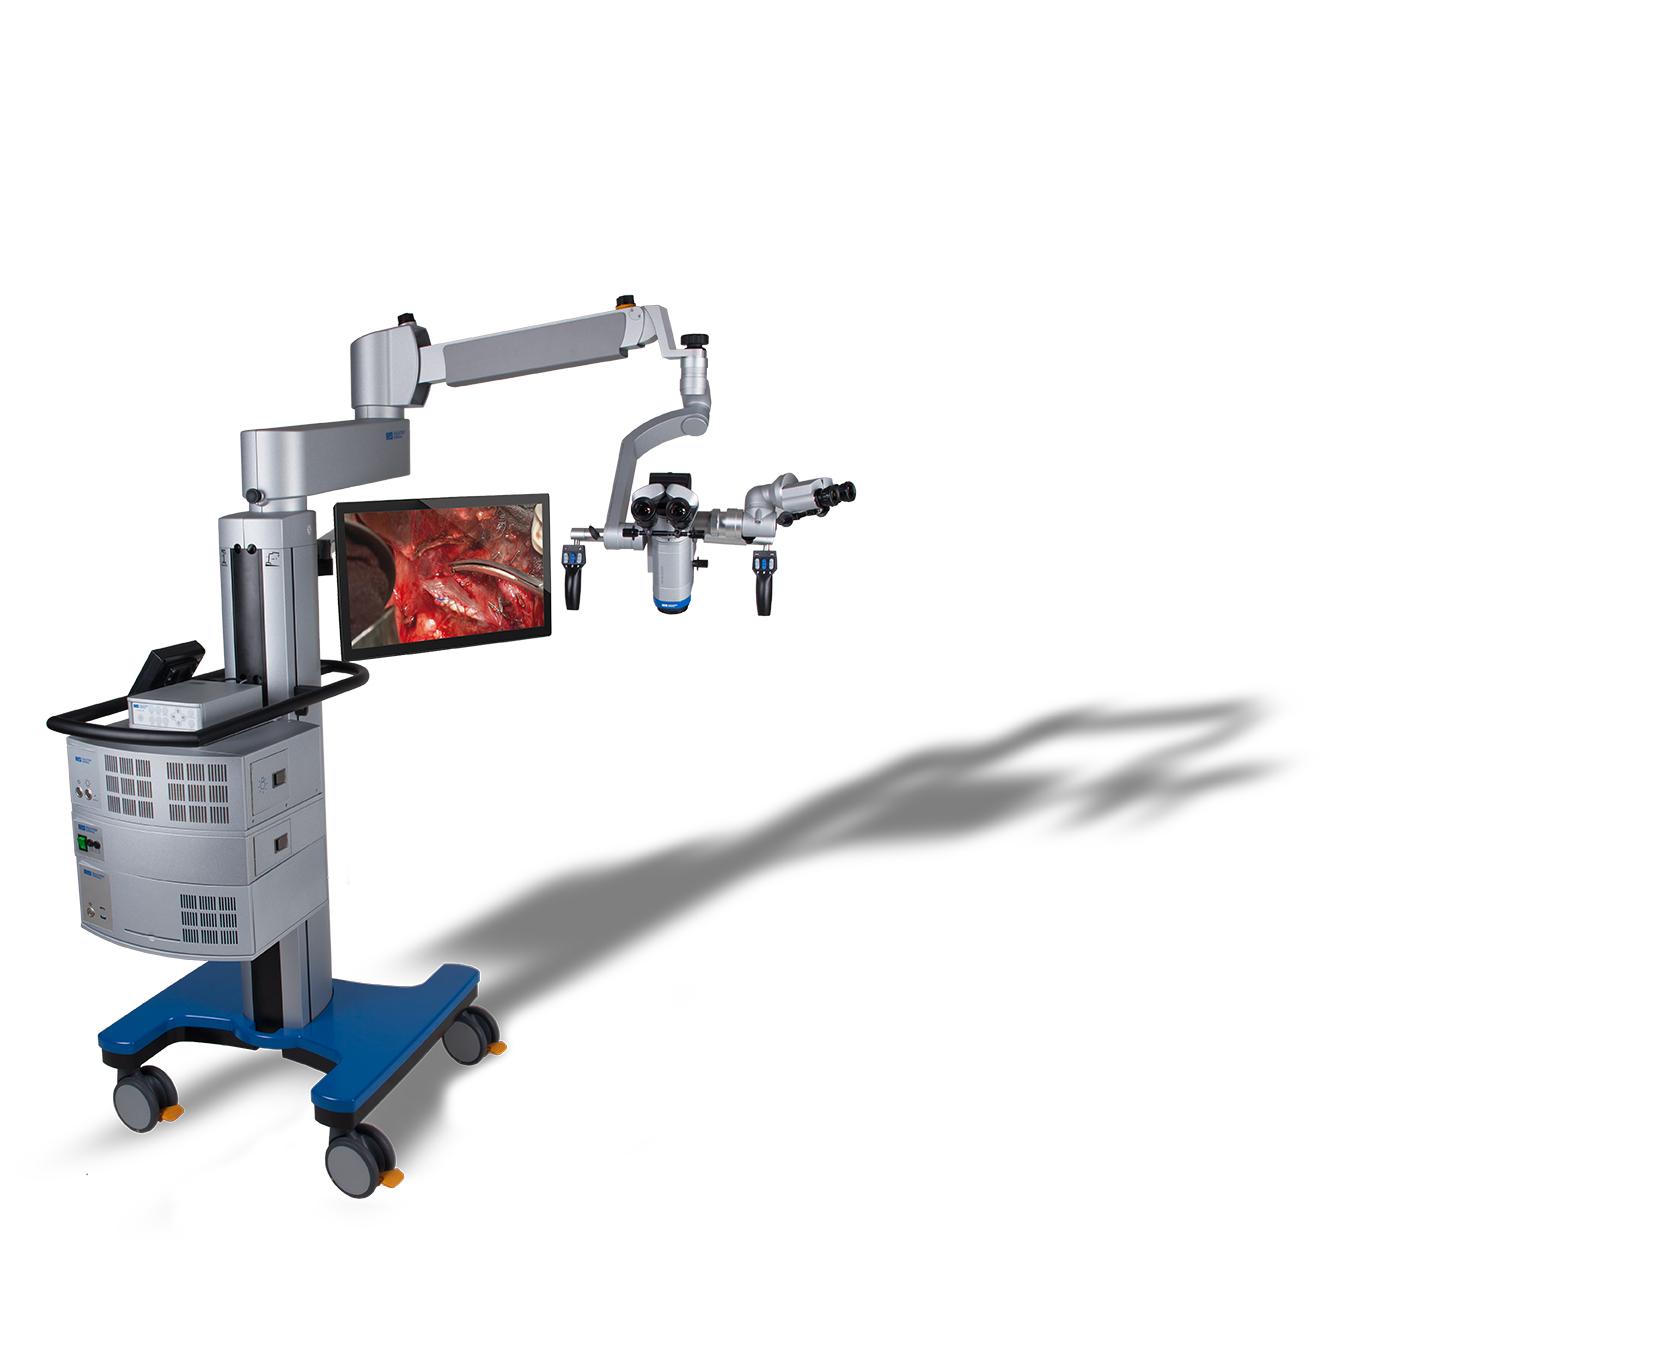 https://www.lameris-group.nl/wp-content/uploads/2020/03/Haag-Streit-Surgical-Allegra-700-microscoop.jpg